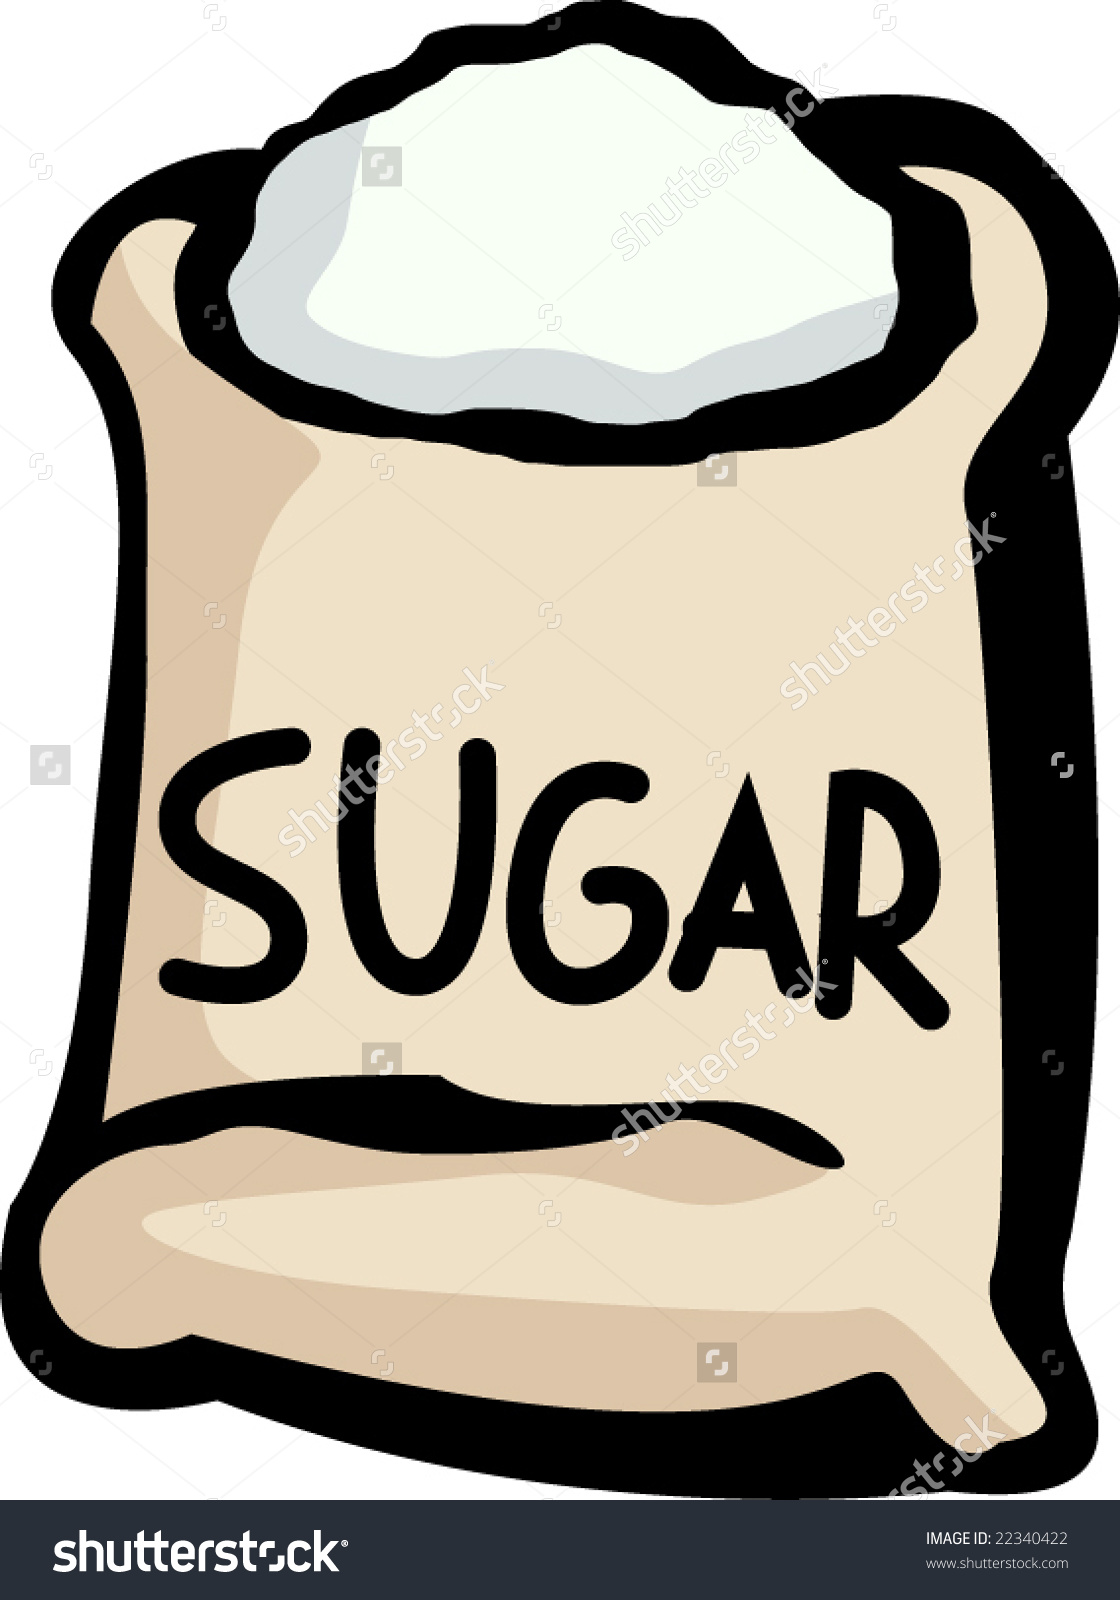 Clipart bag of sugar.